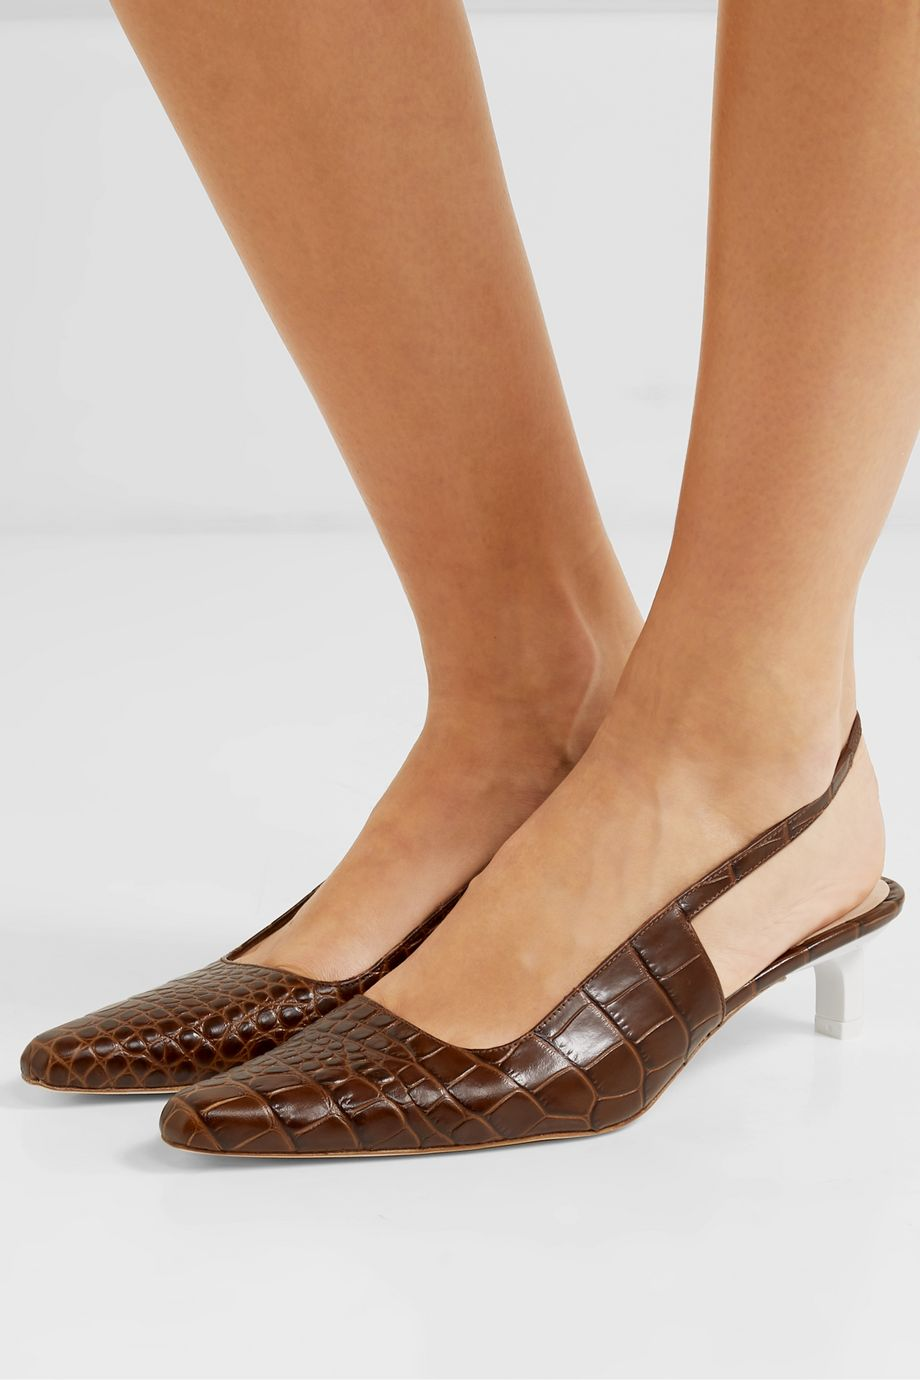 REJINA PYO Lois croc-effect leather slingback pumps